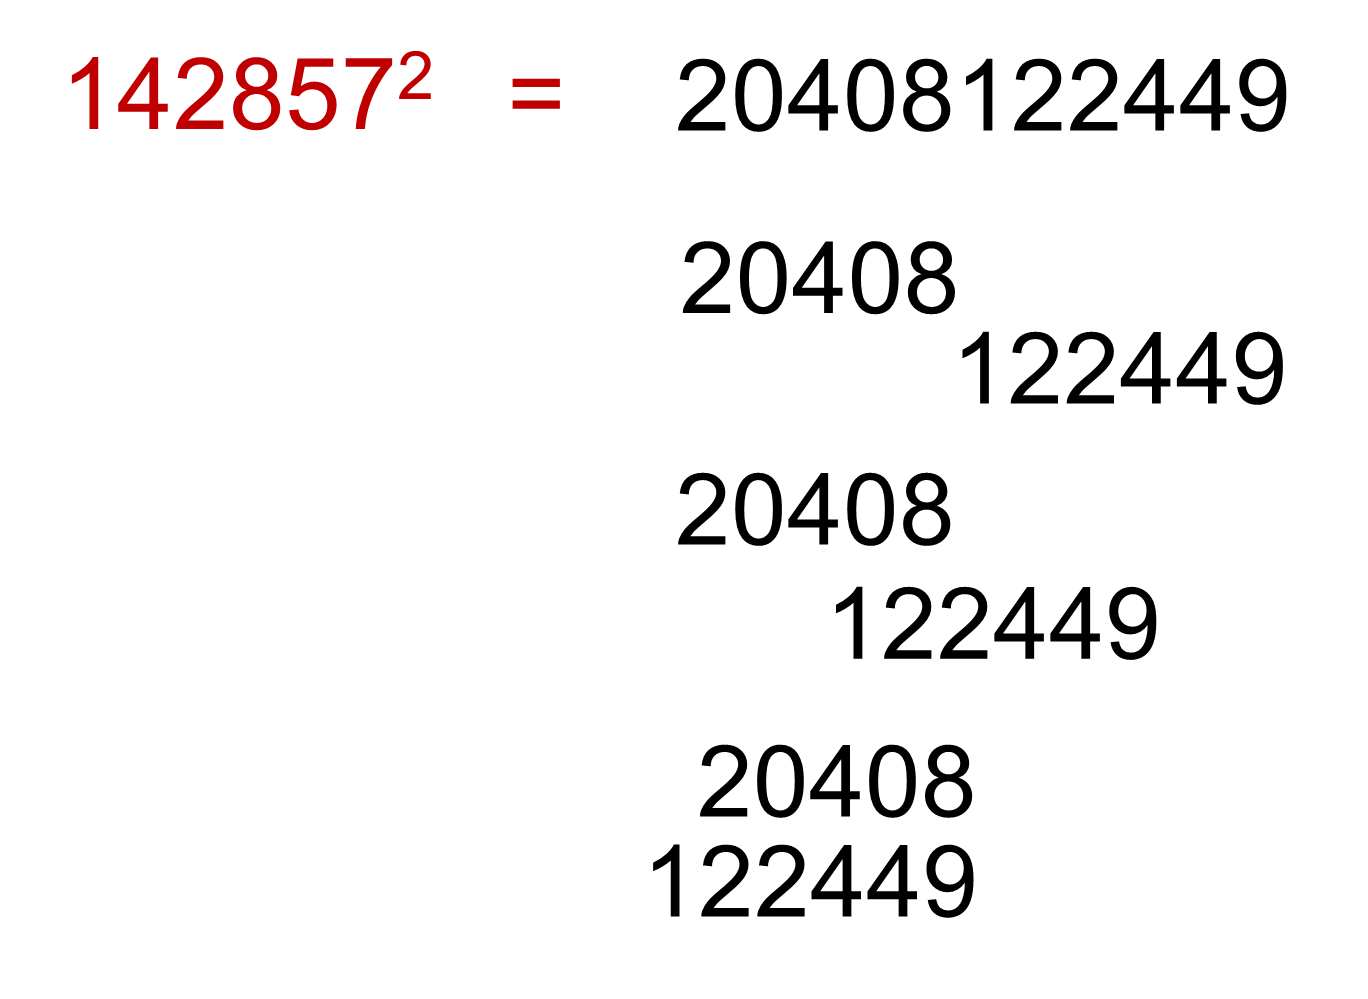 MEDIAN Don Steward mathematics teaching: fractions to